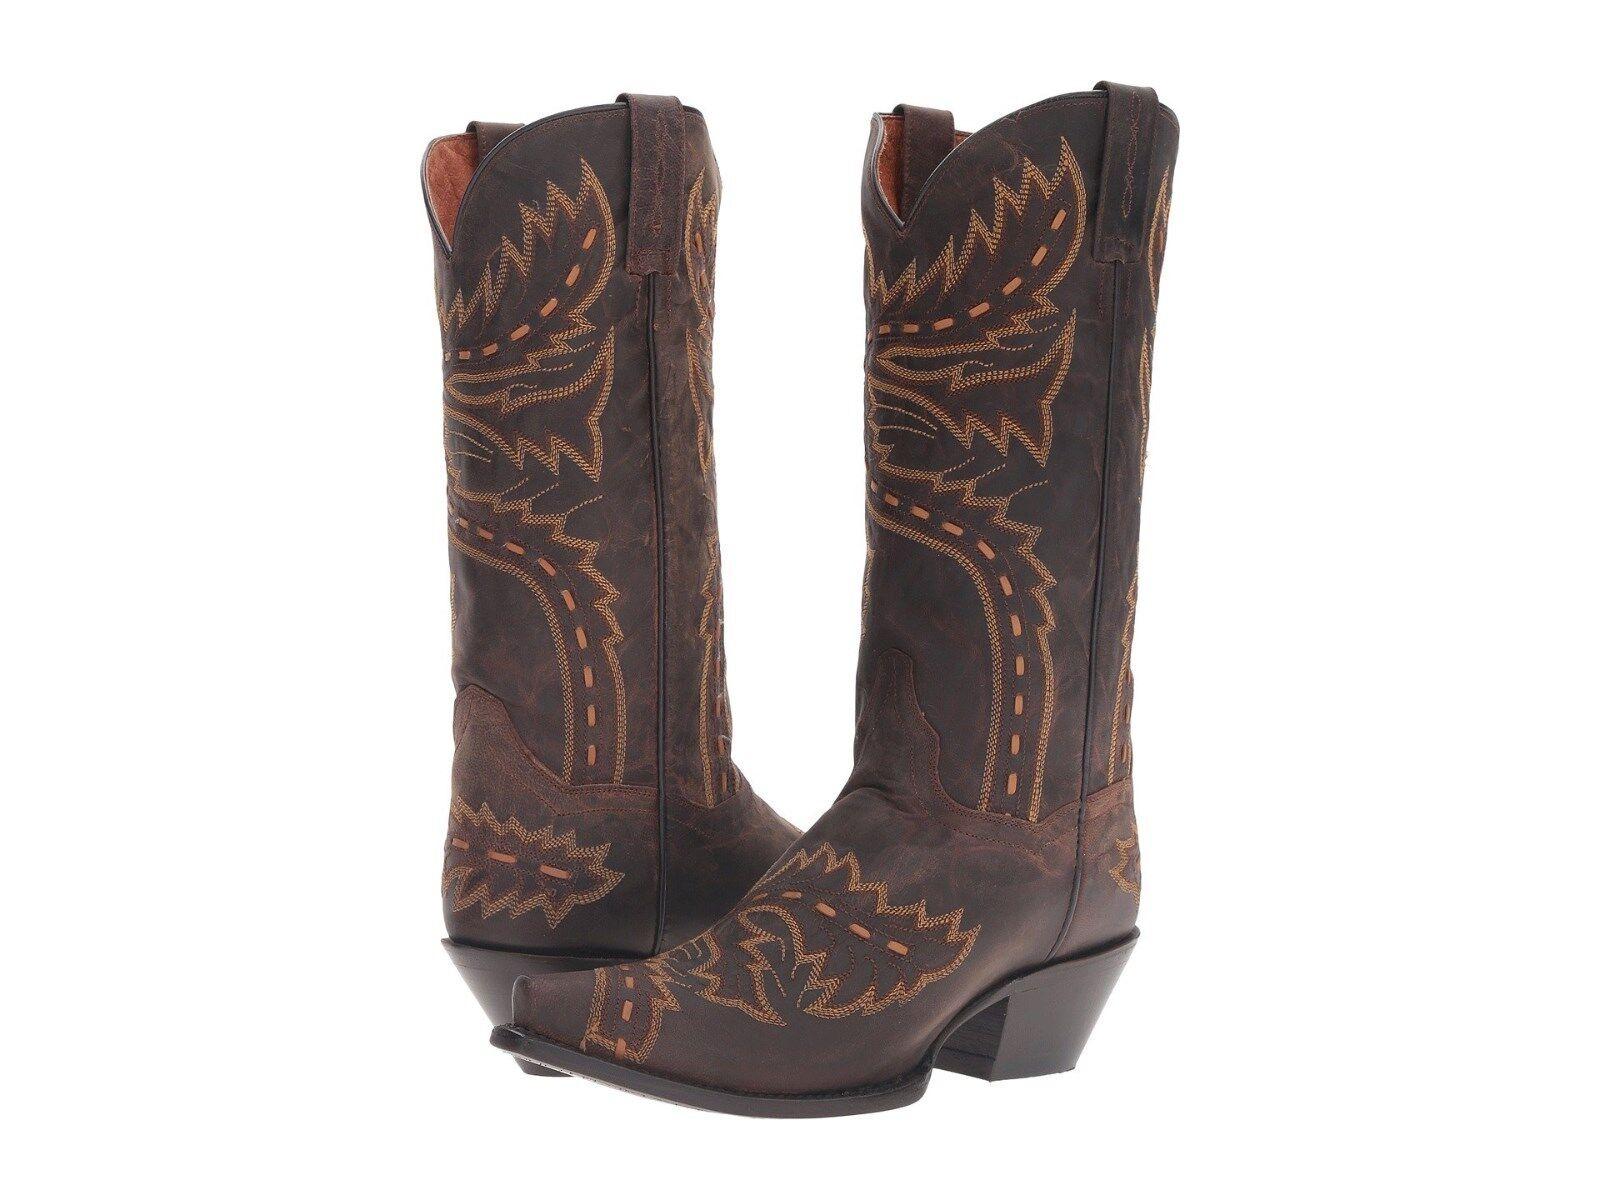 Dan Post Sidewinder  Womens Boots Leather  Brown  9.5  NIB